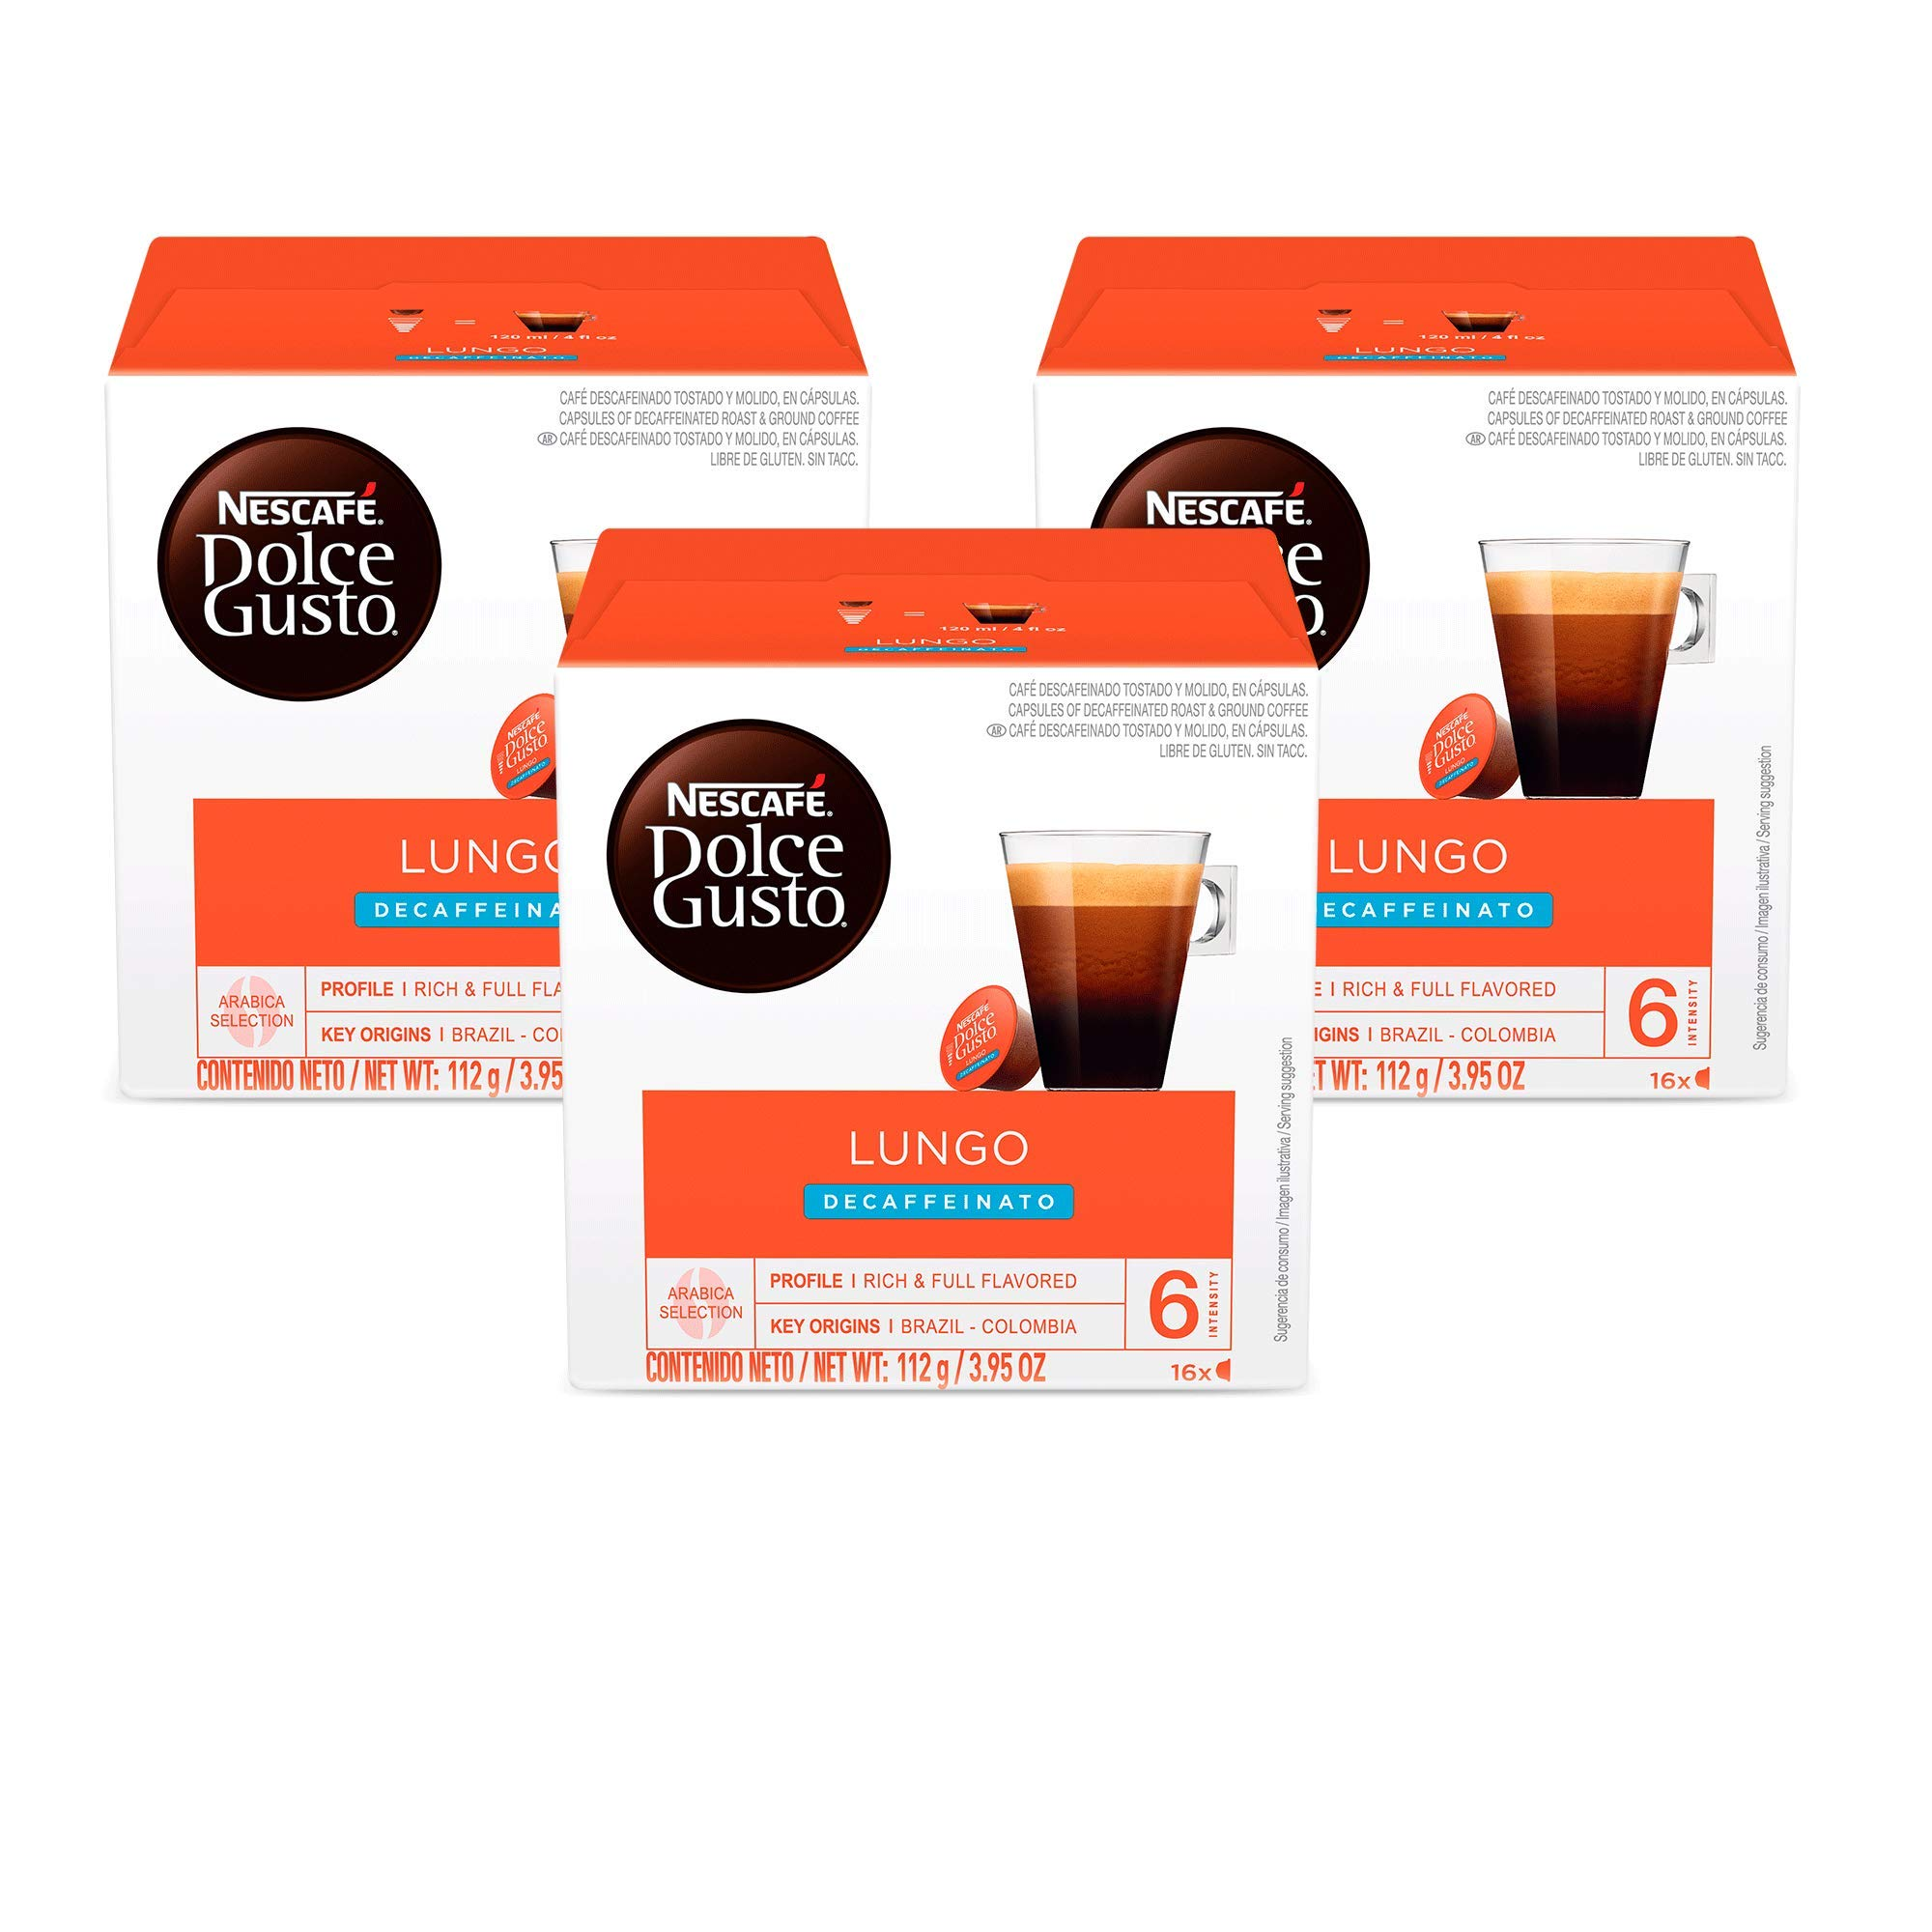 Nescafe Dolce Gusto Coffee Pods, Lungo Decaffeinato, 16 capsules, Pack of 3